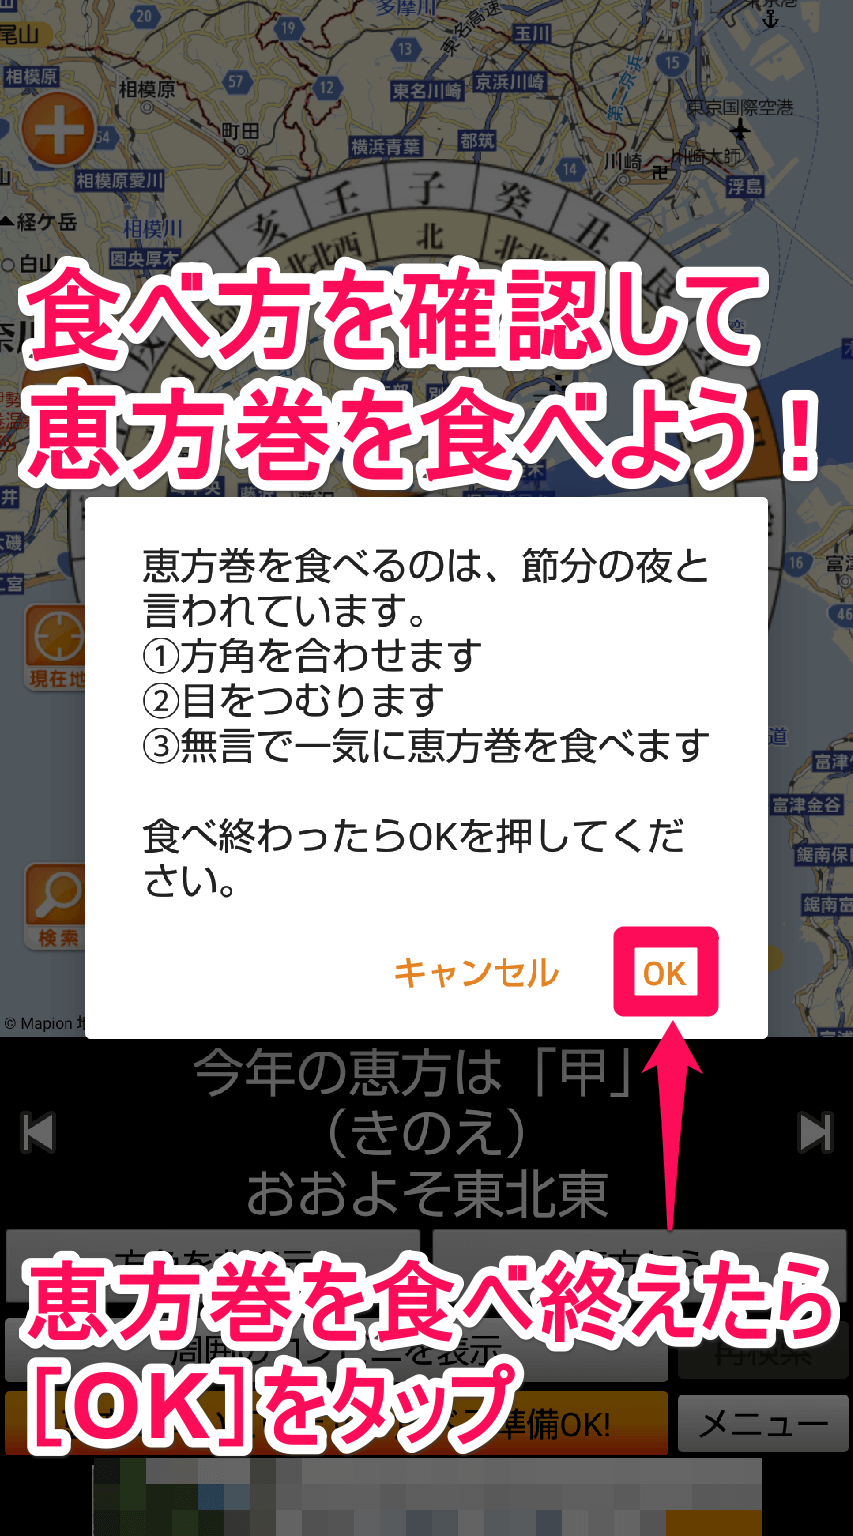 Android(アンドロイド)版&iPhone(アイフォーン)版「恵方マピオン」で恵方巻を食べるルールが表示された画面